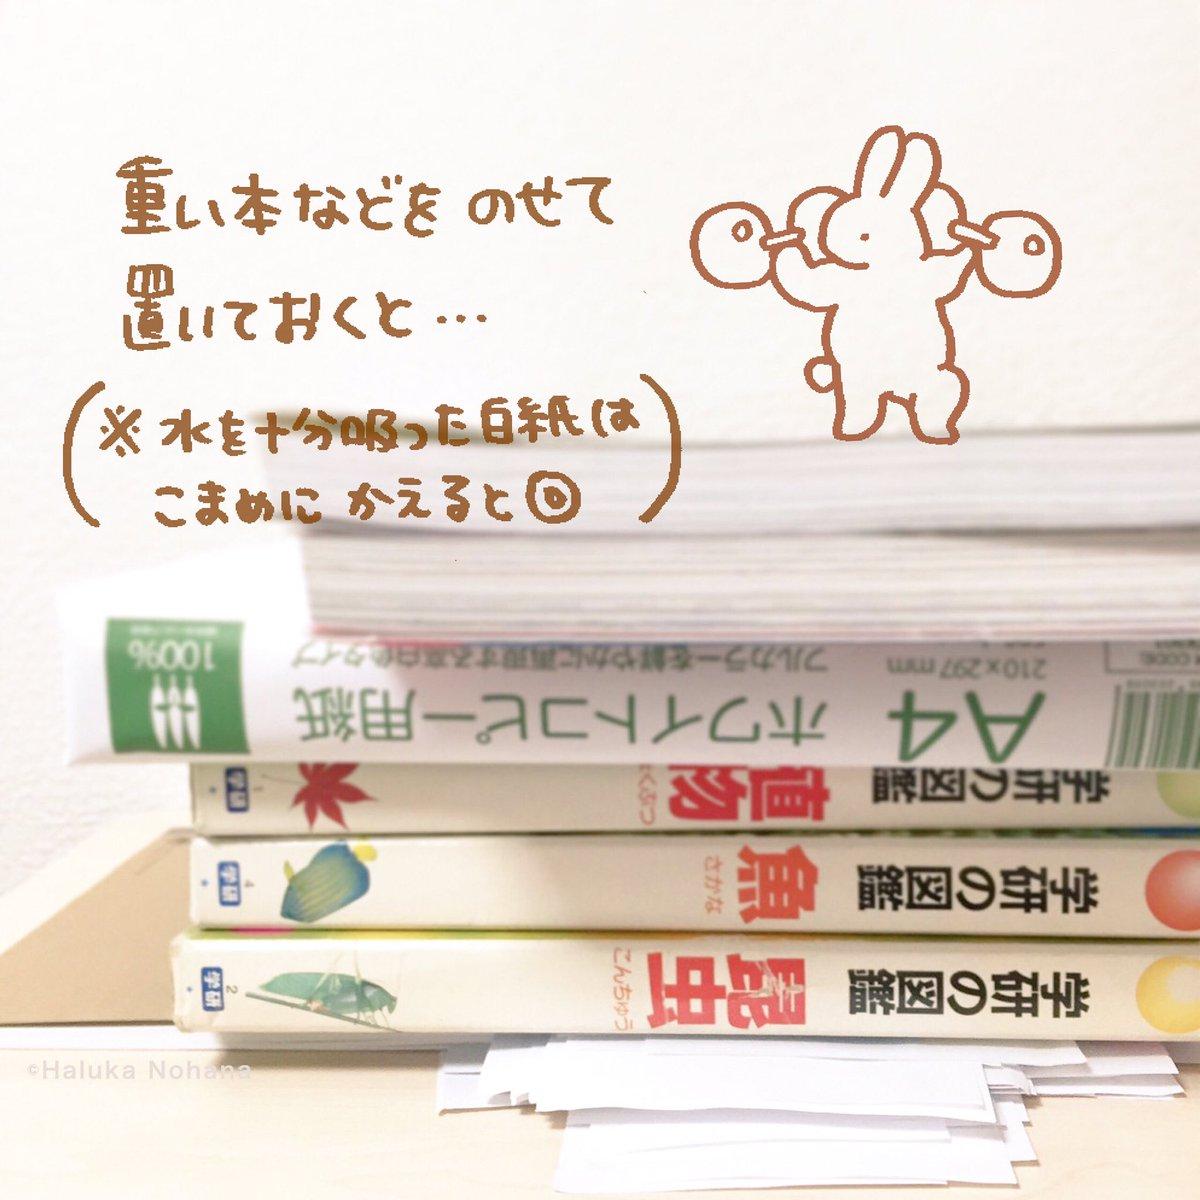 haruka-nohana-diy-fix-wet-book-pages-3